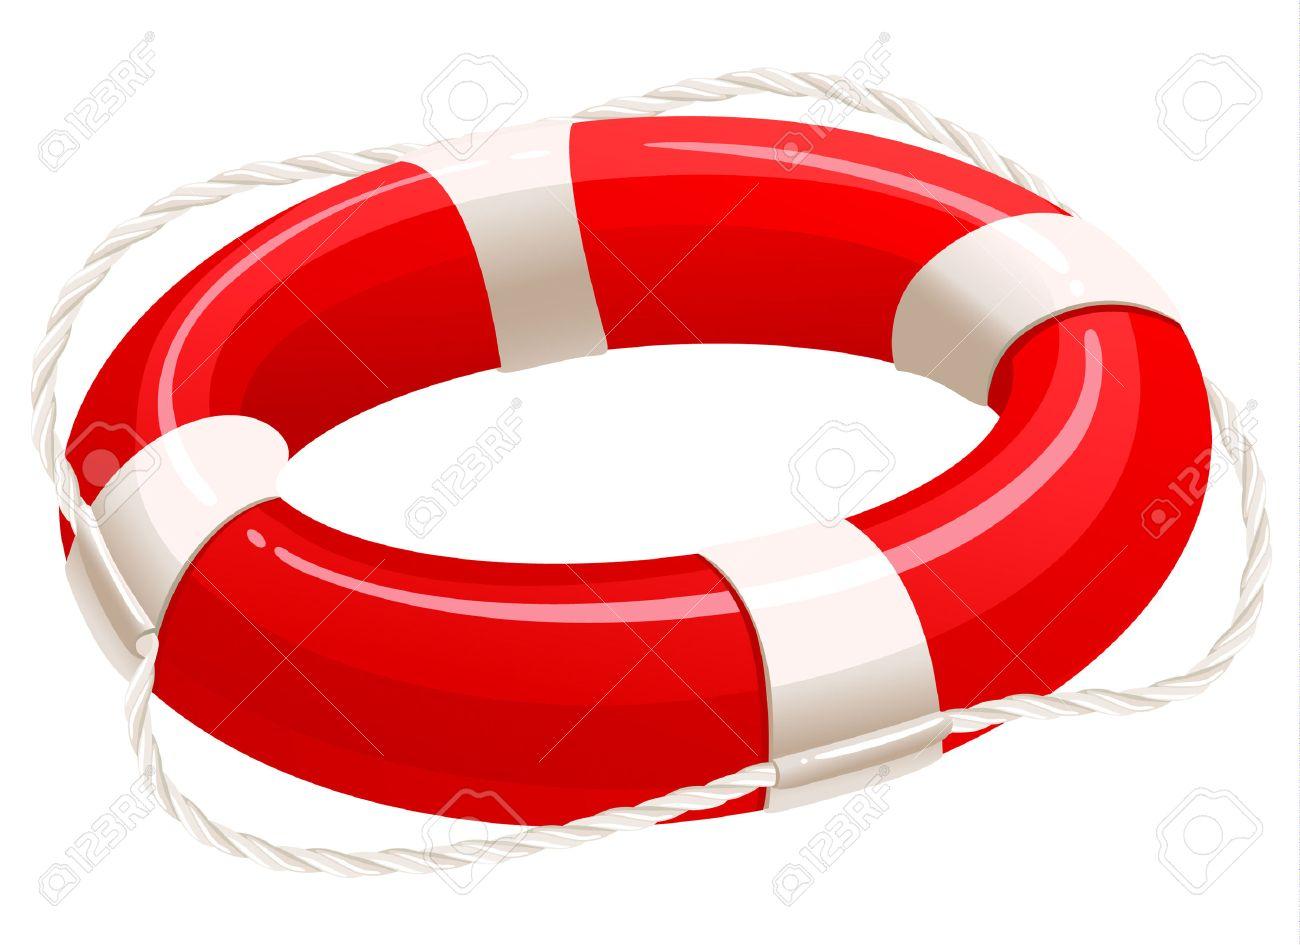 Life buoy, cartoon illustration Stock Vector - 7298150